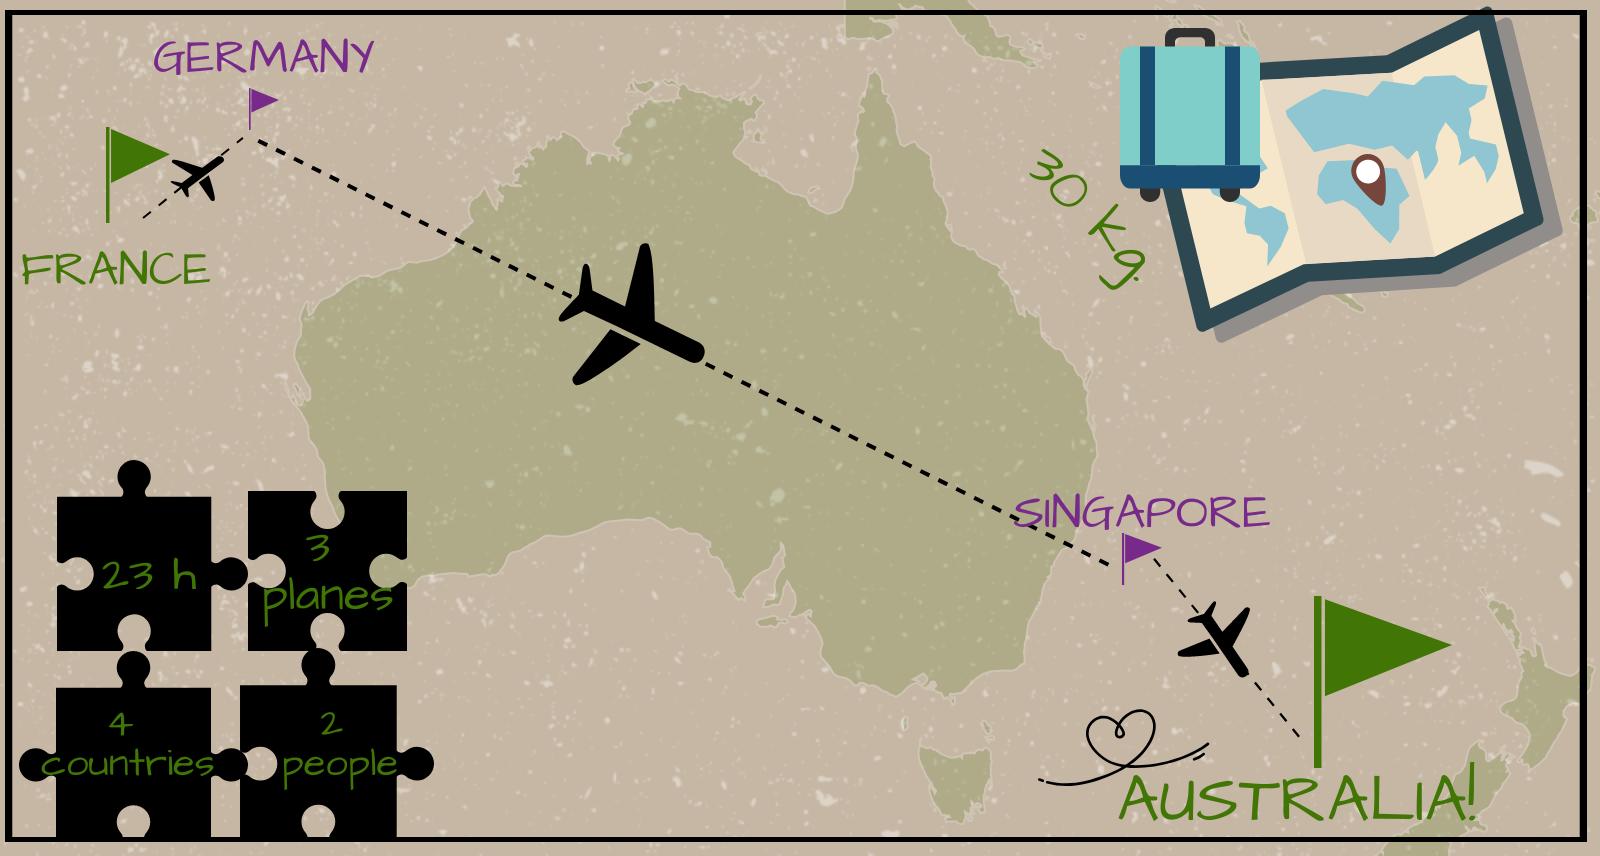 plan lotu do Australii